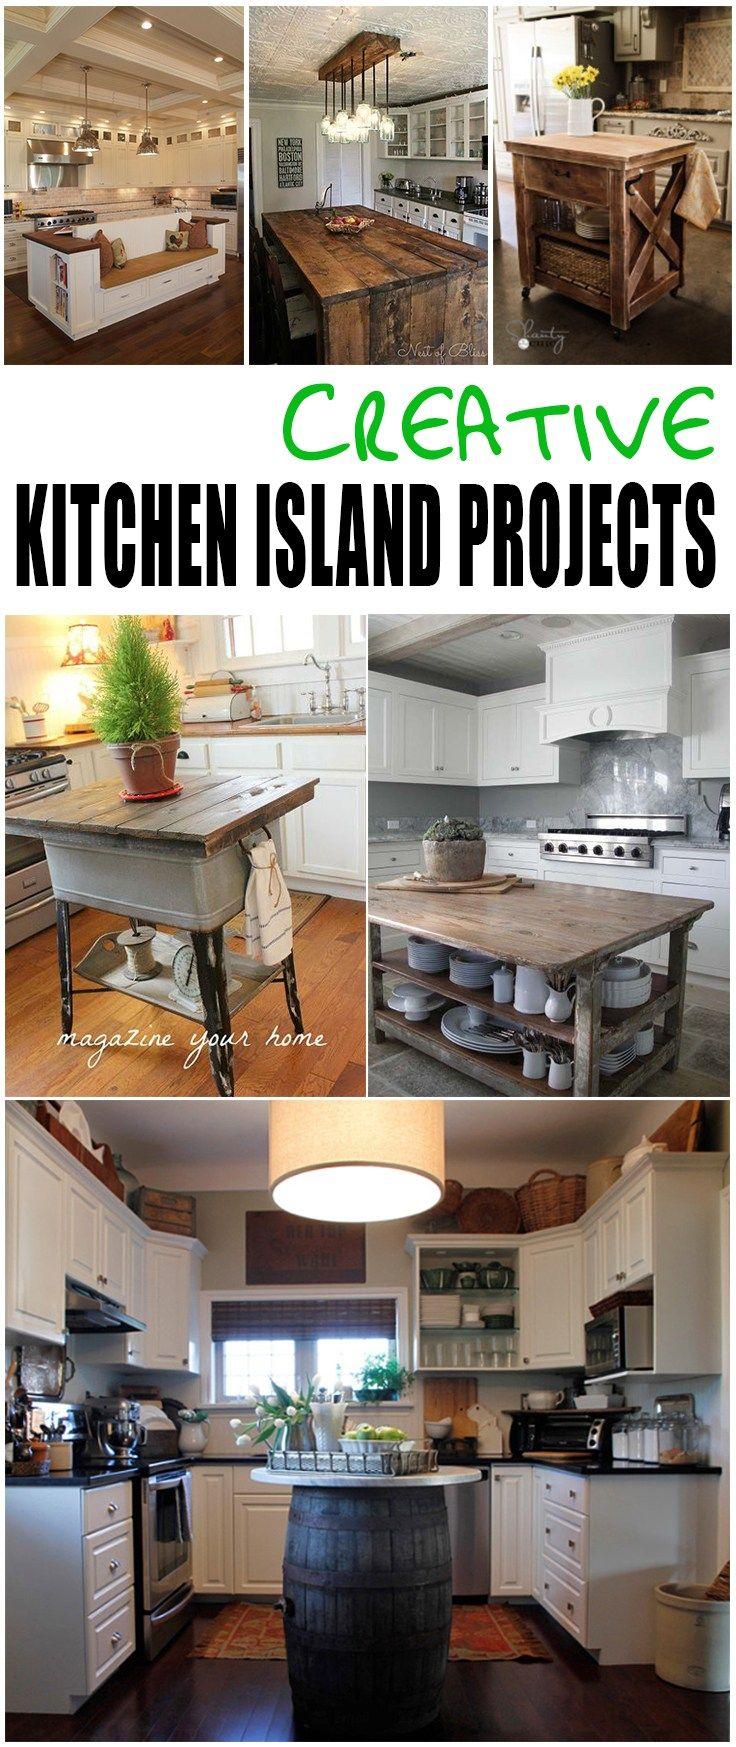 Medium Of Kitchen Island Projects